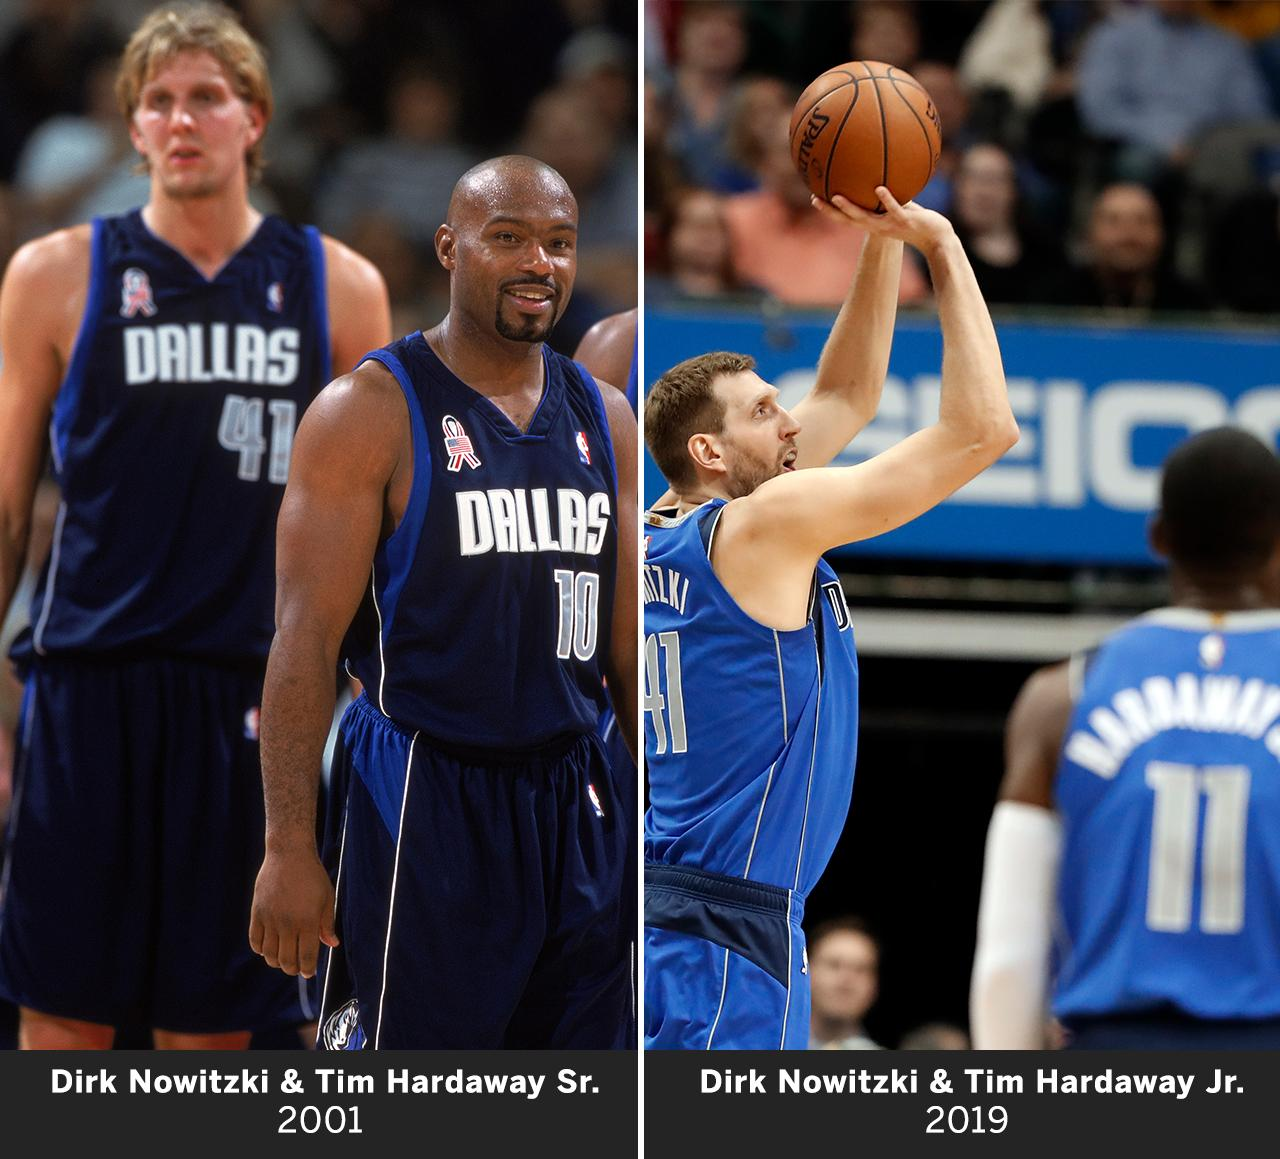 Two generations of Hardaways. Same ol' Dirk. https://t.co/6lq7qkc3an